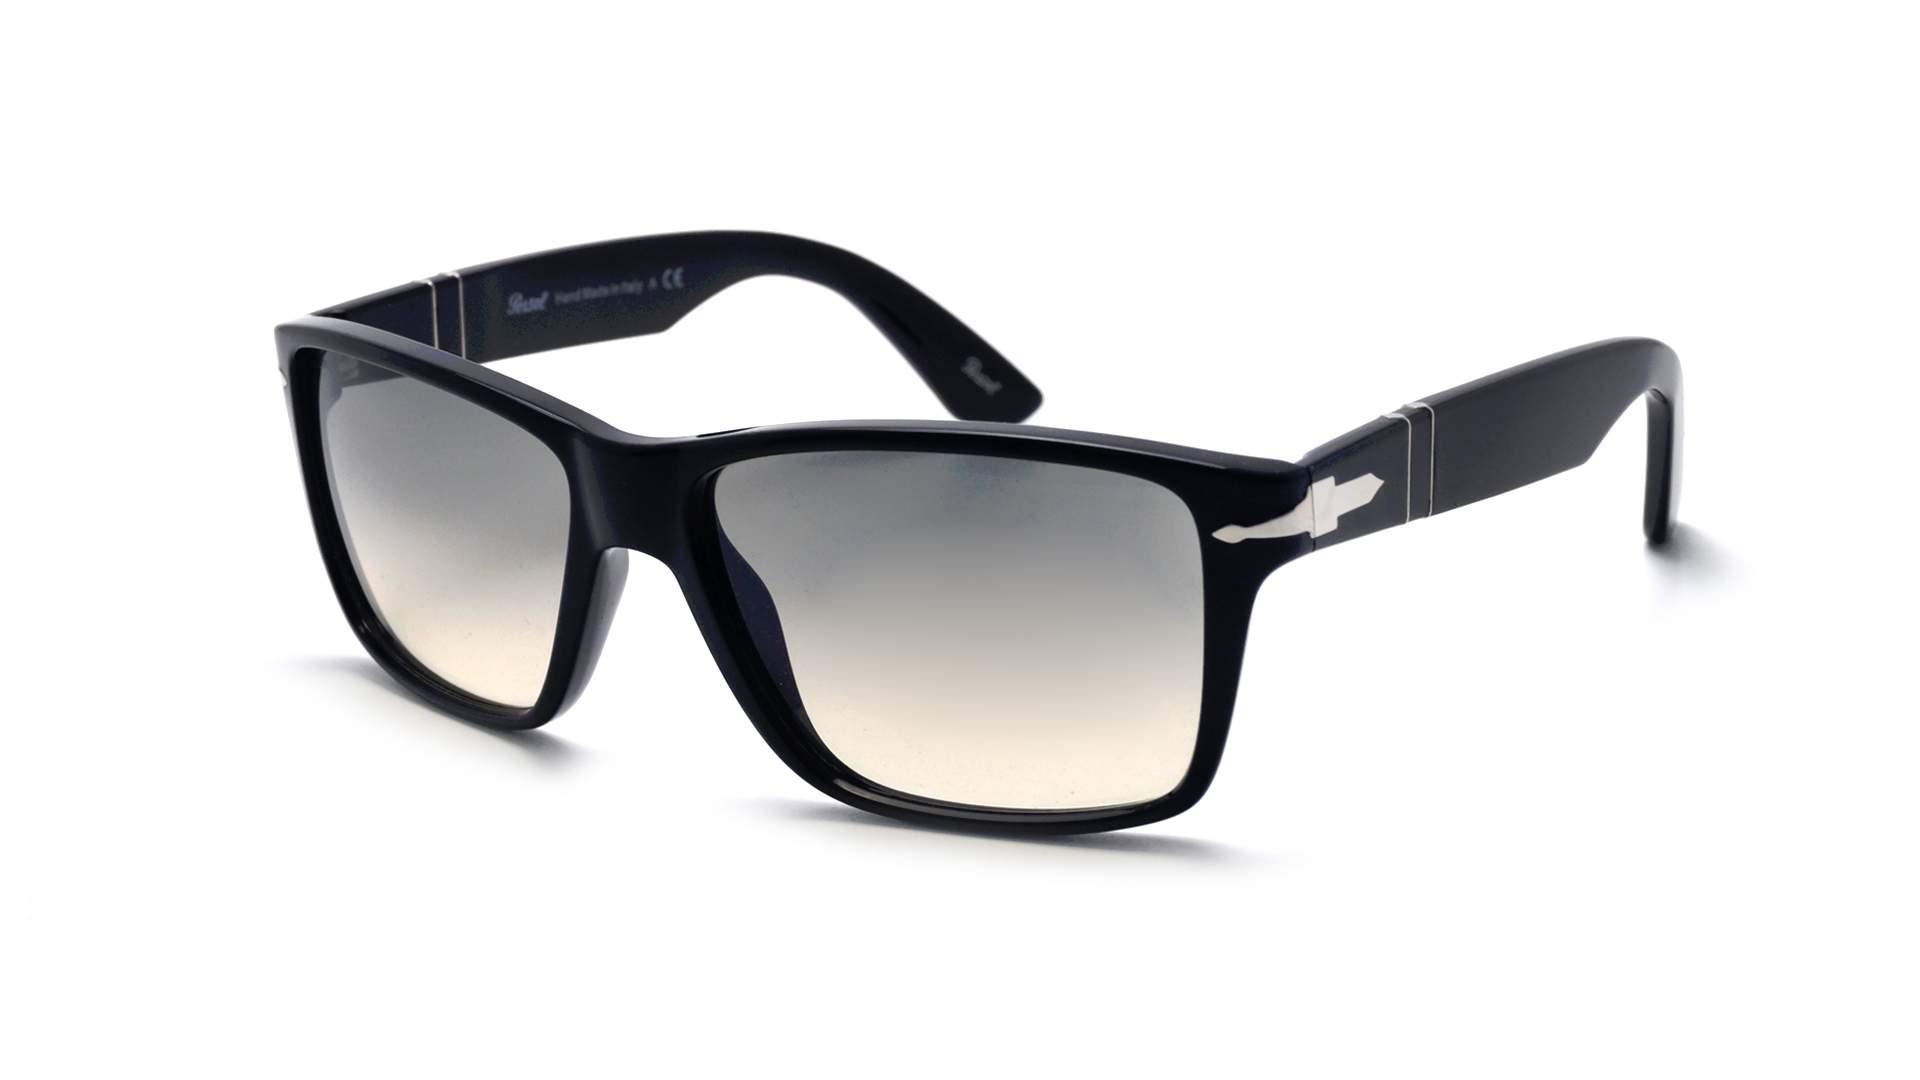 51287f3269 Sunglasses Persol PO3195S 1041 32 58-16 Black Large Gradient